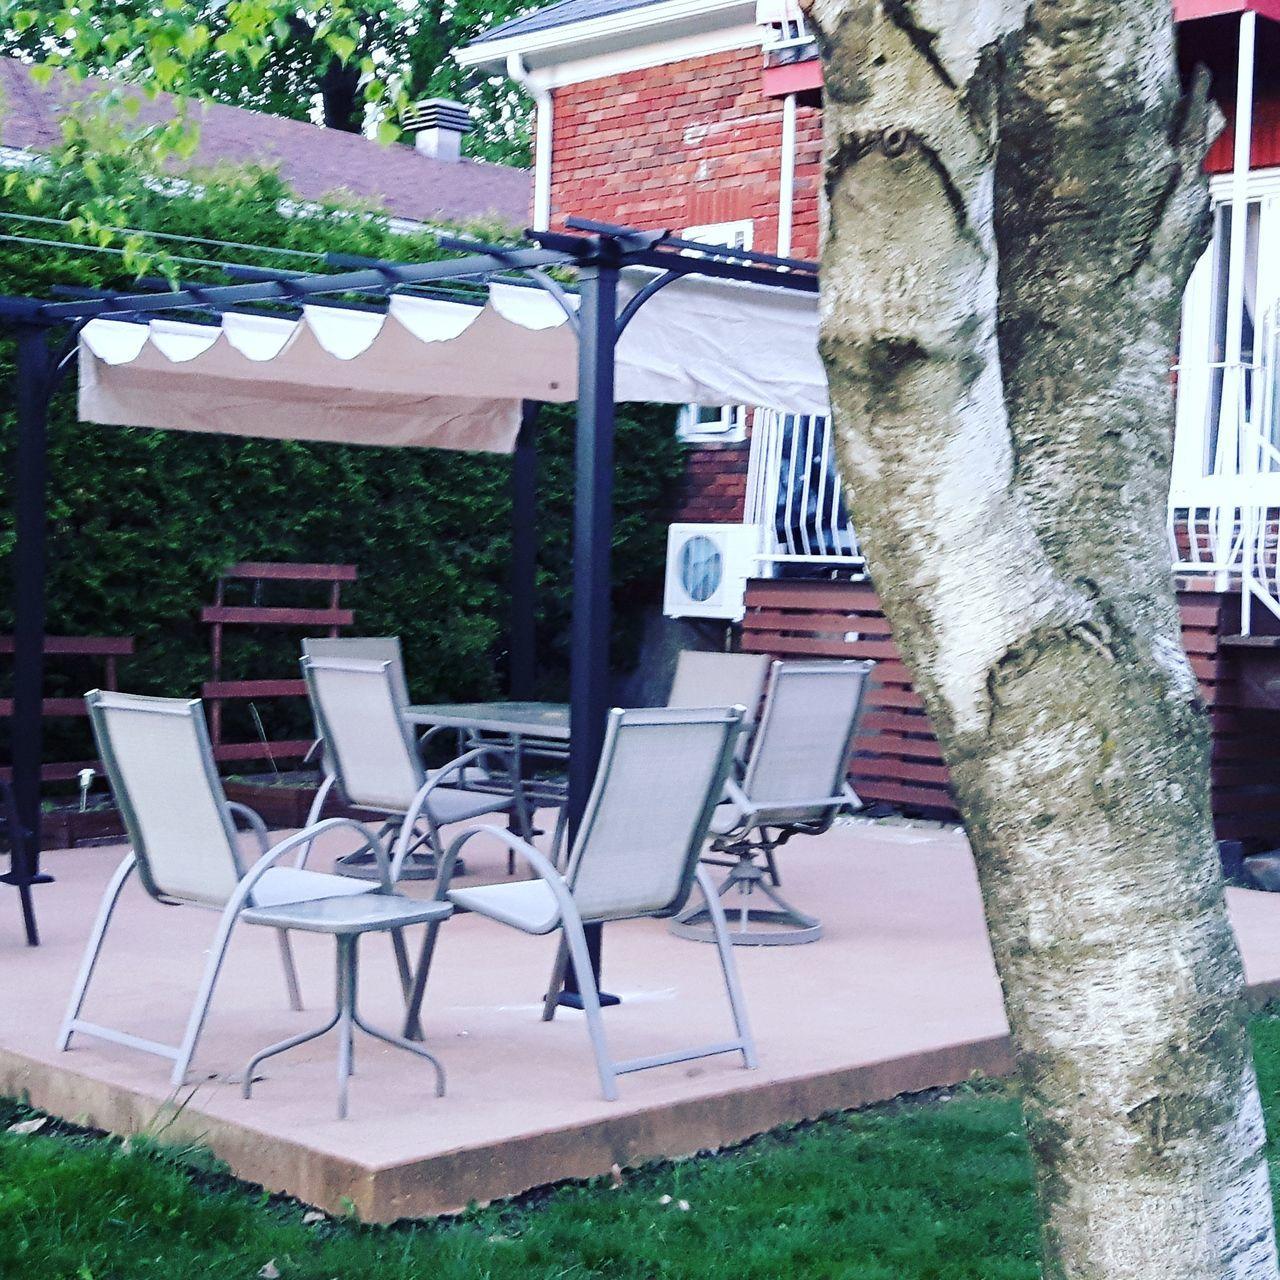 Chair Table Arrangement Pergola Outdoors Backyard Granby